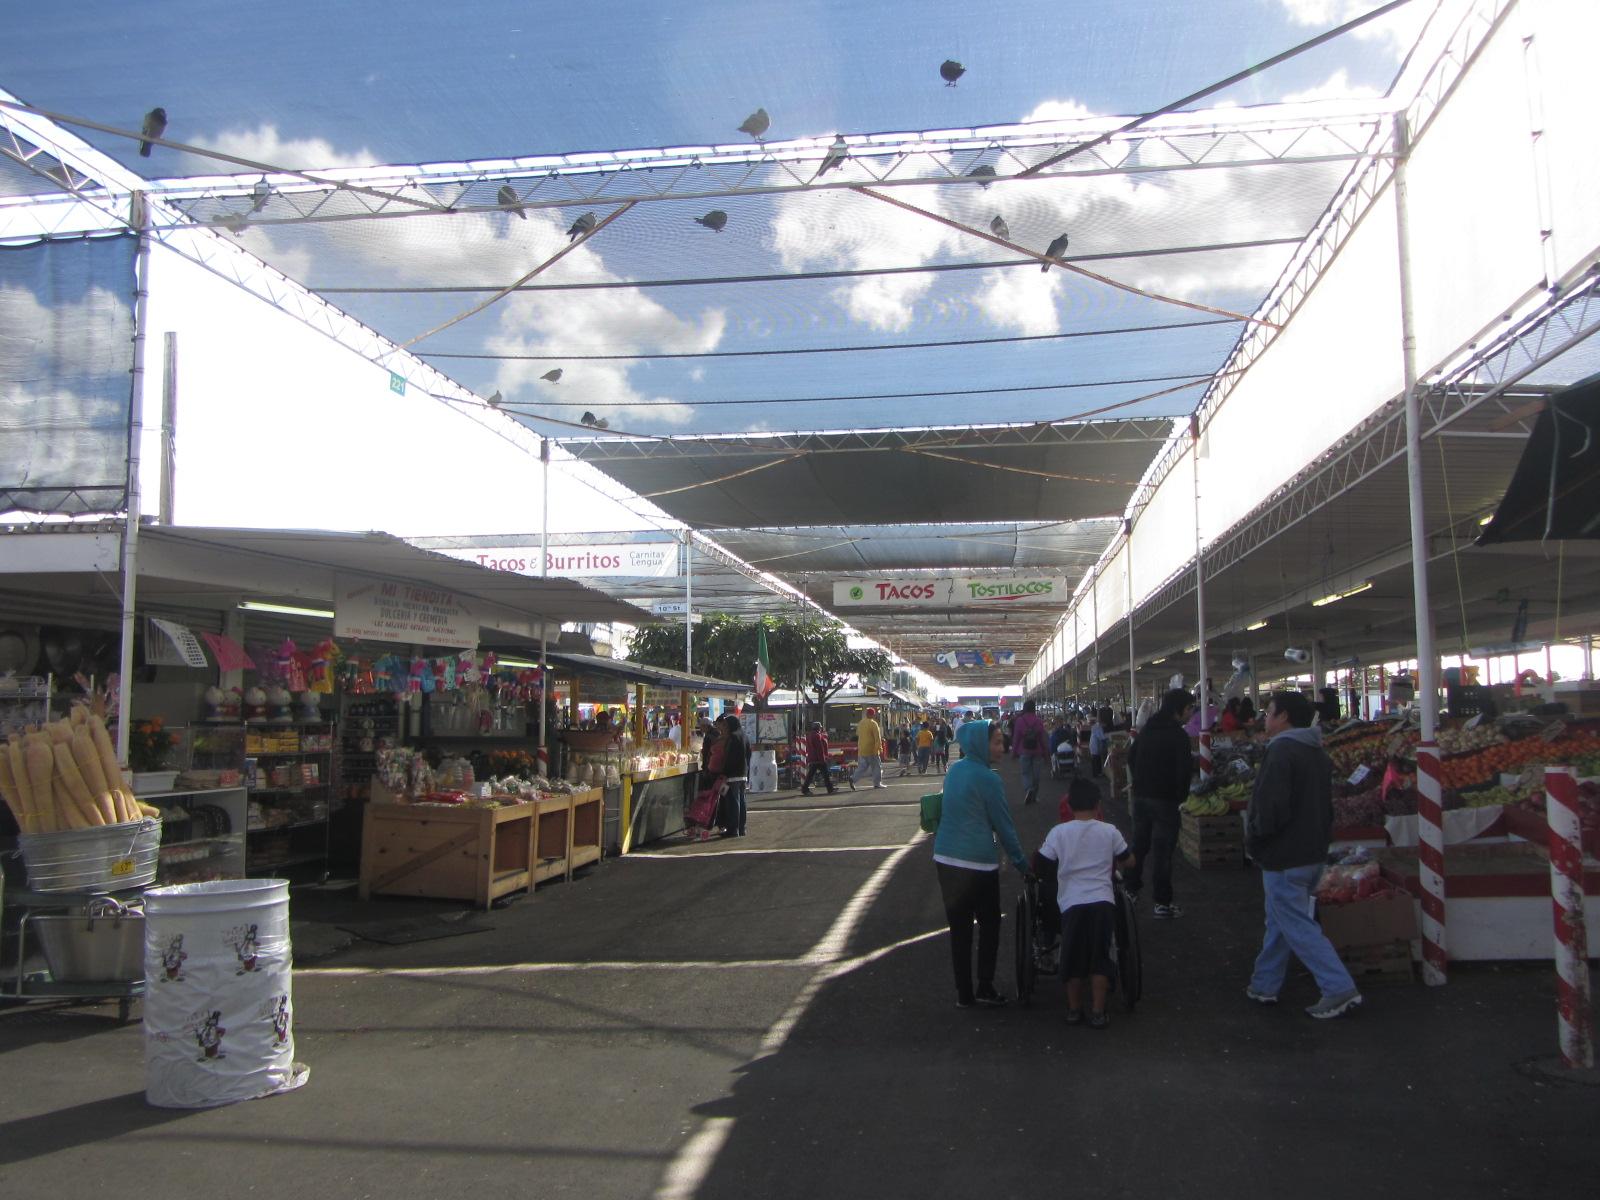 South Bay San Jose Flea Market